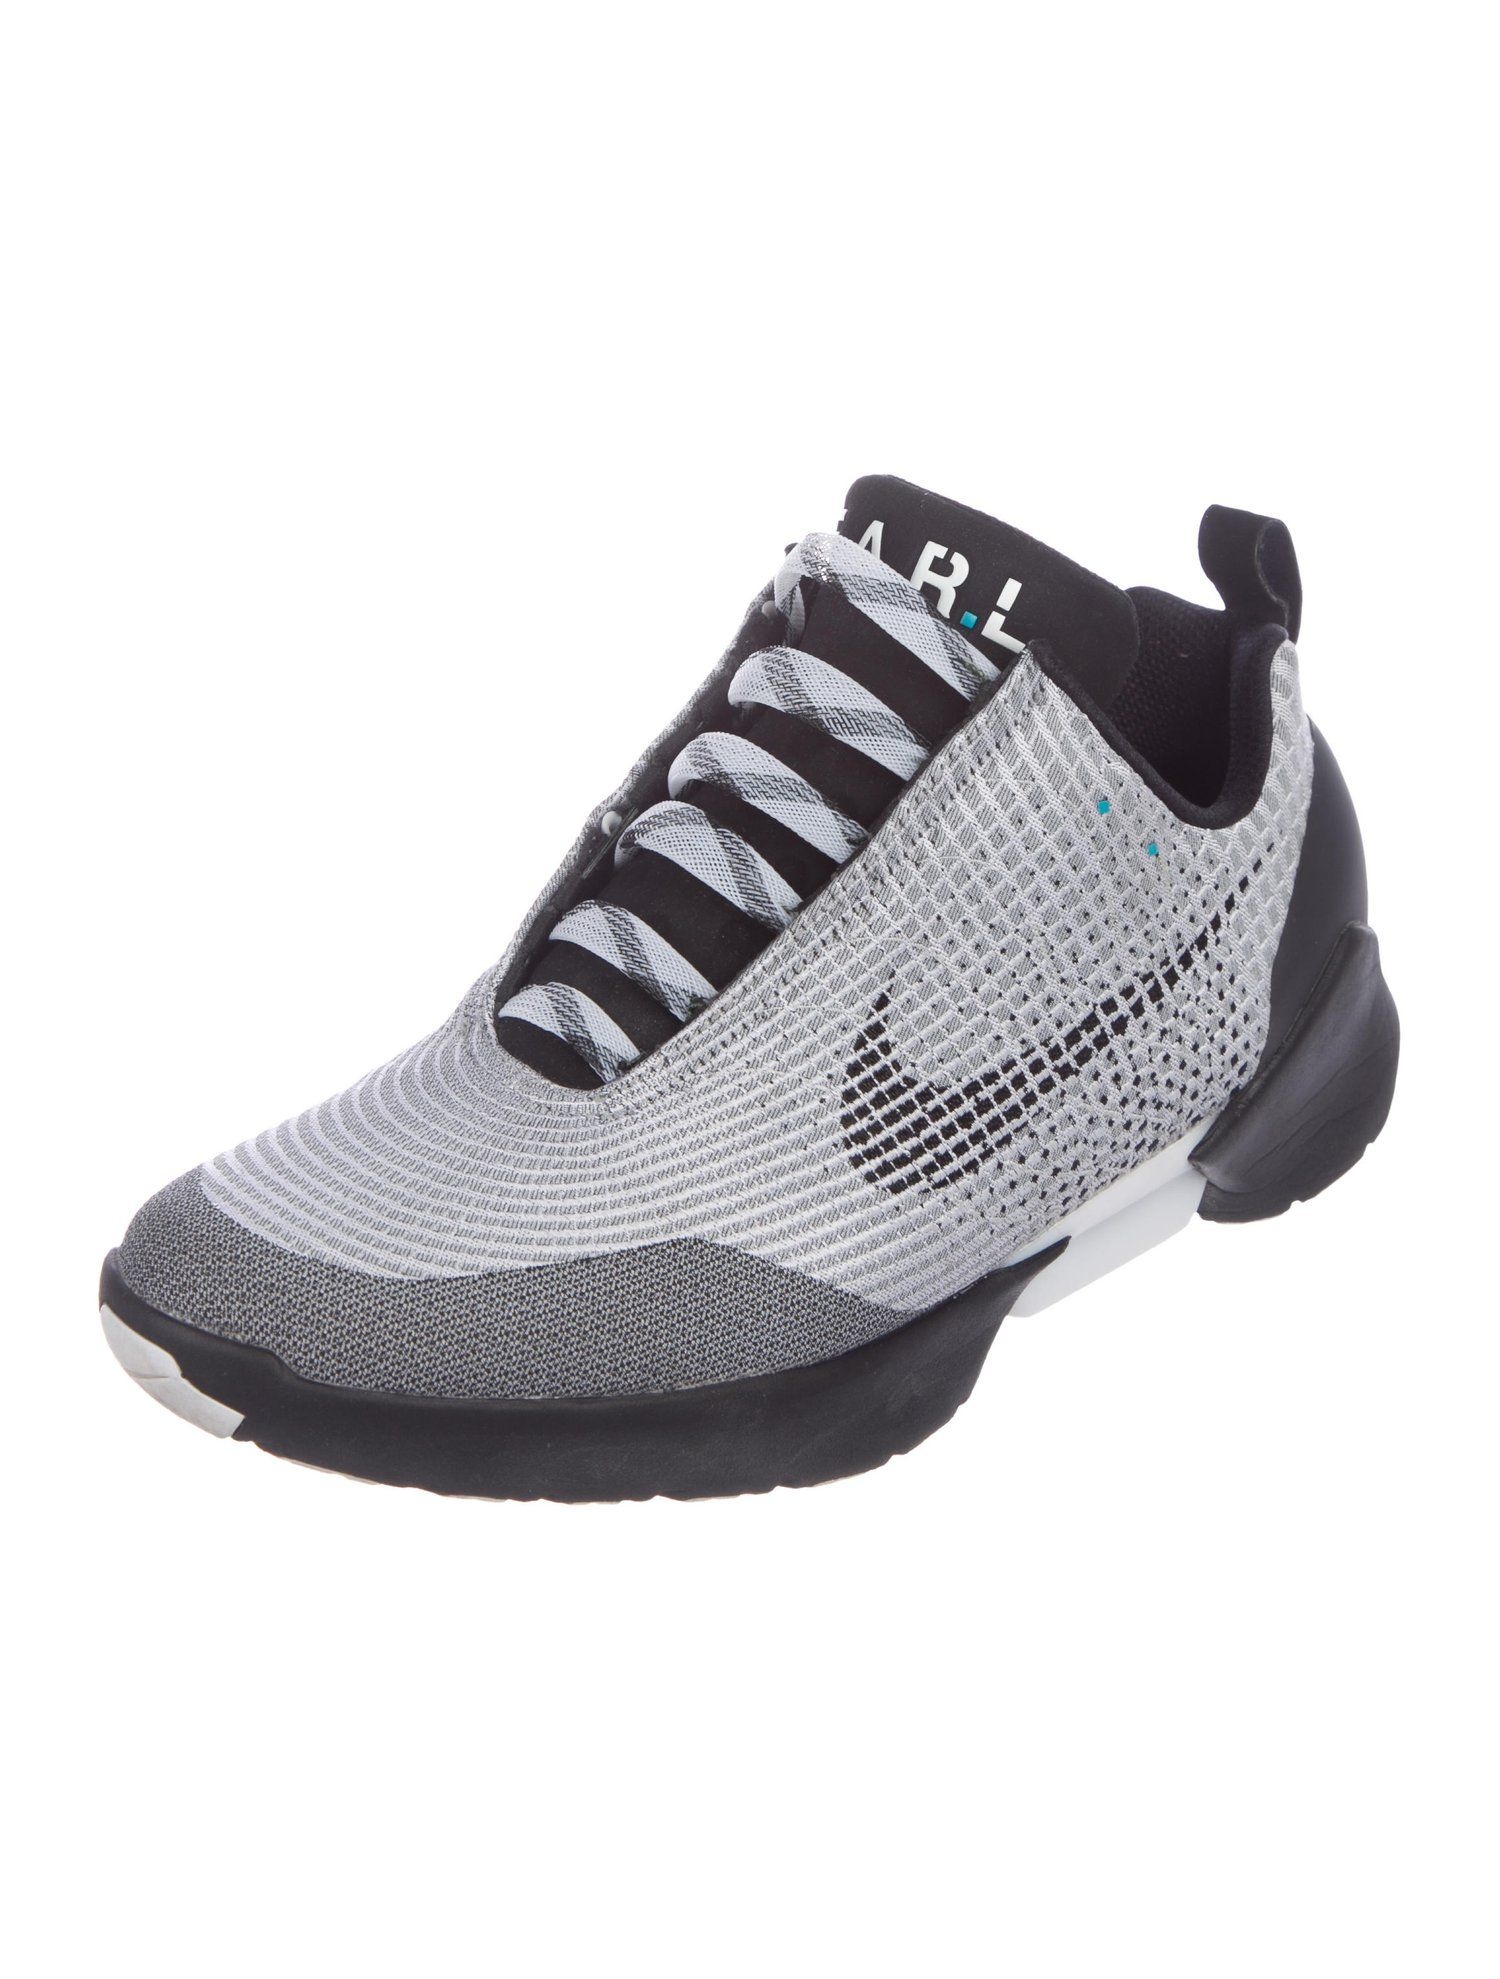 Nike 2016 Hyper Adapt 1.0 Self -Lacing Sneakers  Hyper  Nike  Adapt c3fb74360